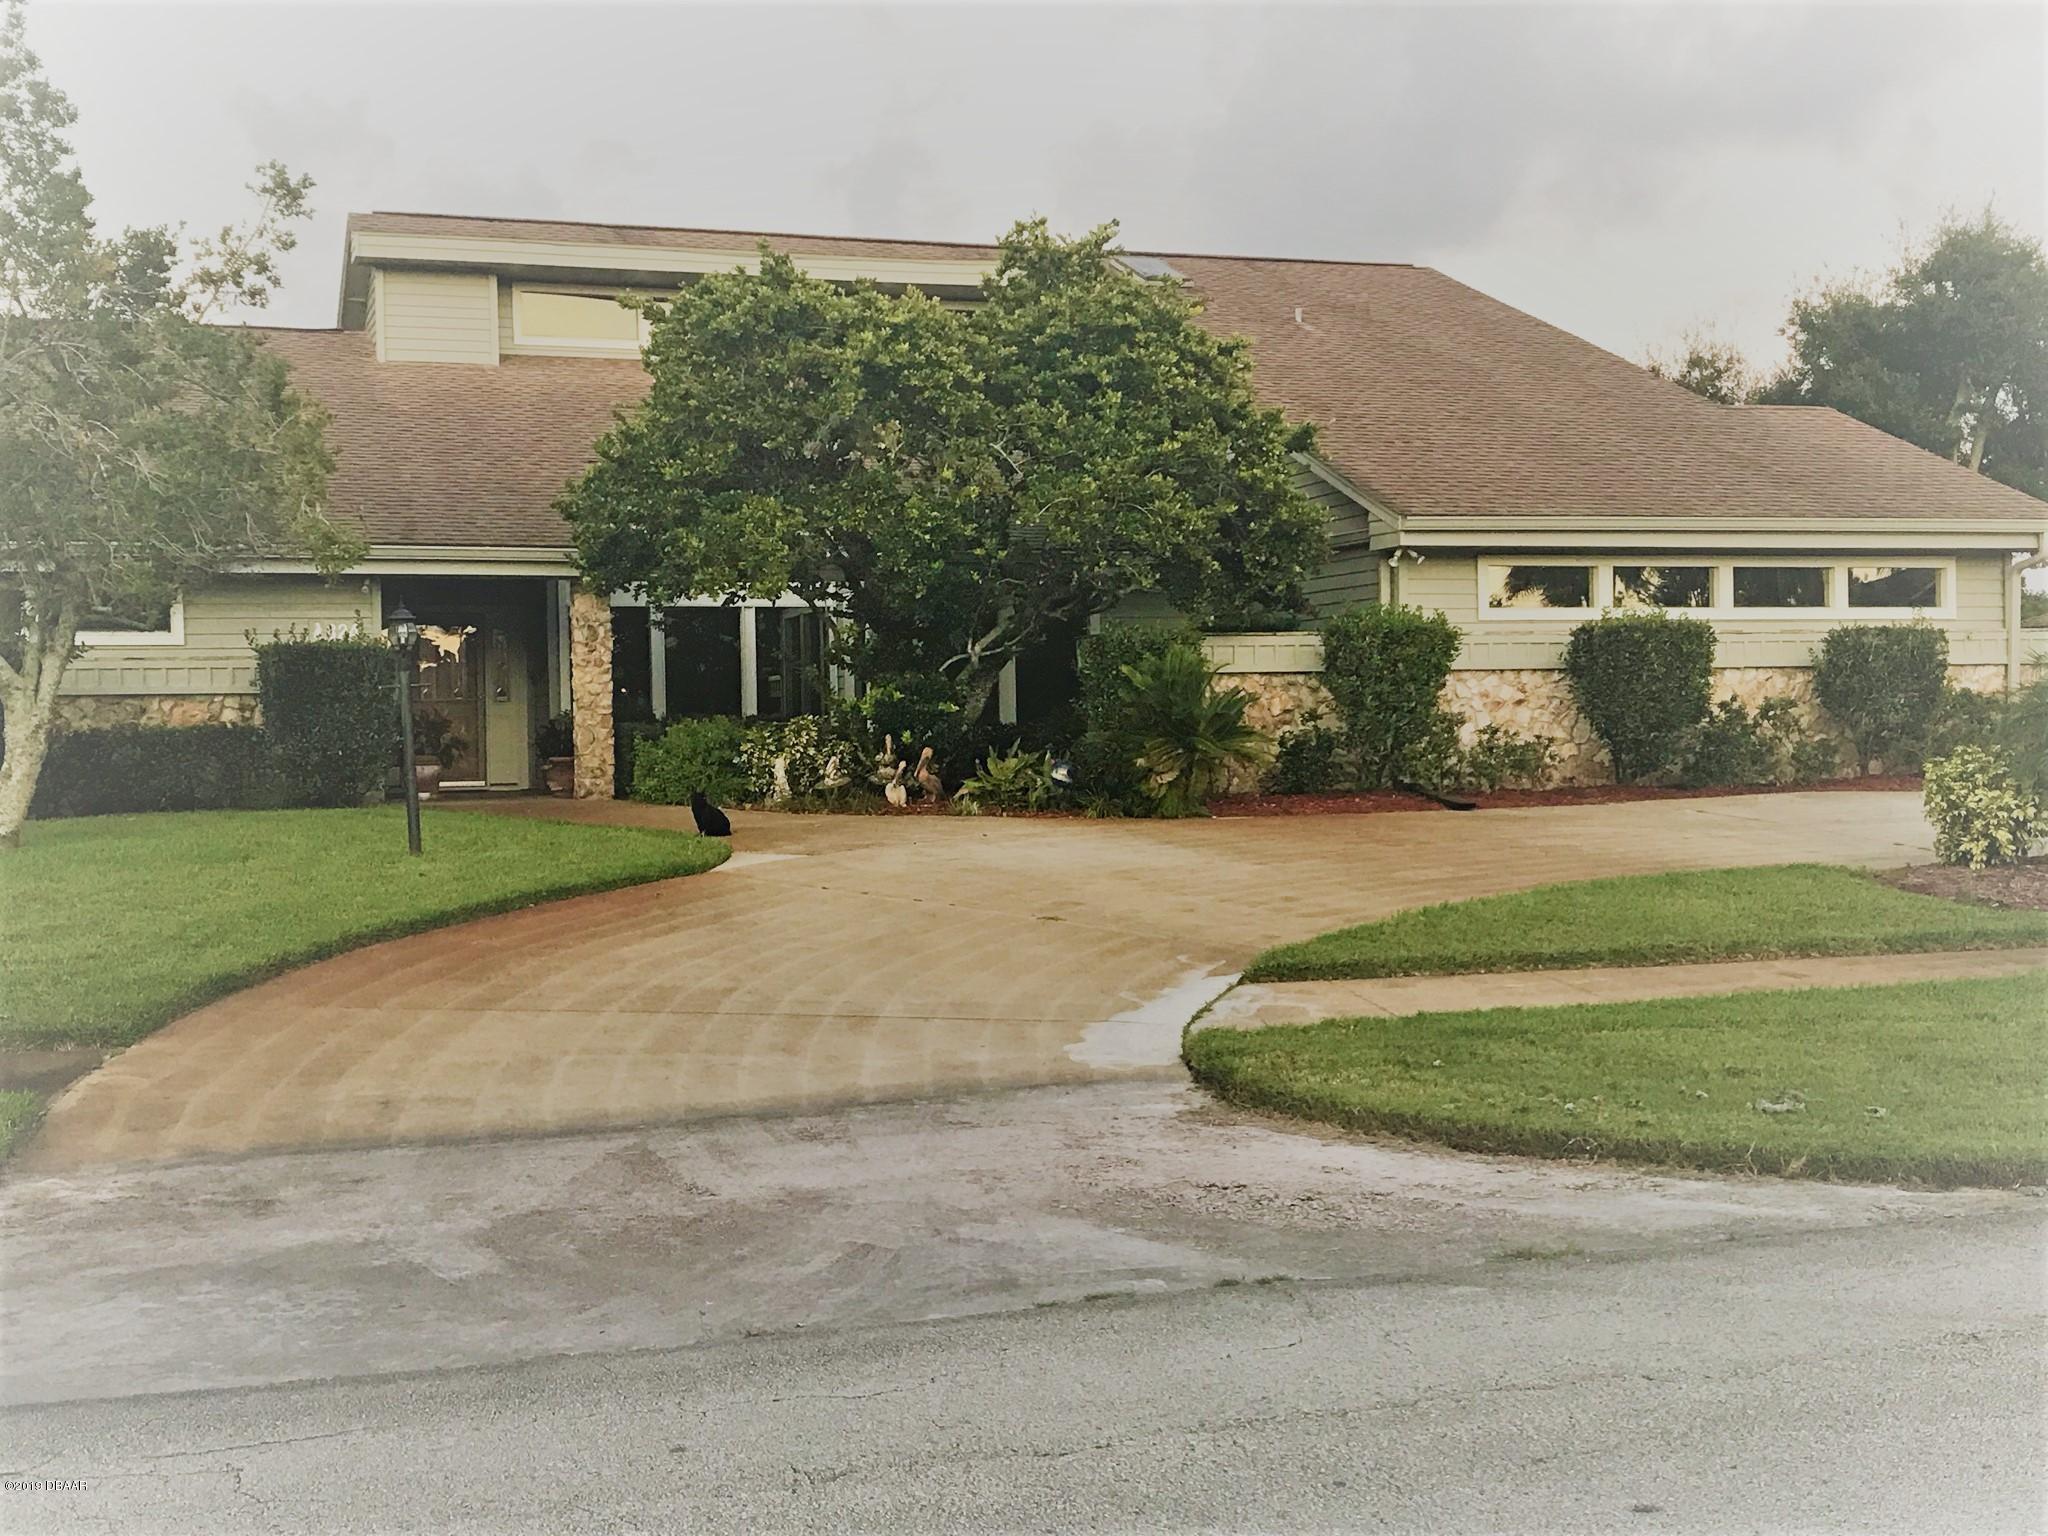 824 Pelican Bay Drive, South Daytona, Florida